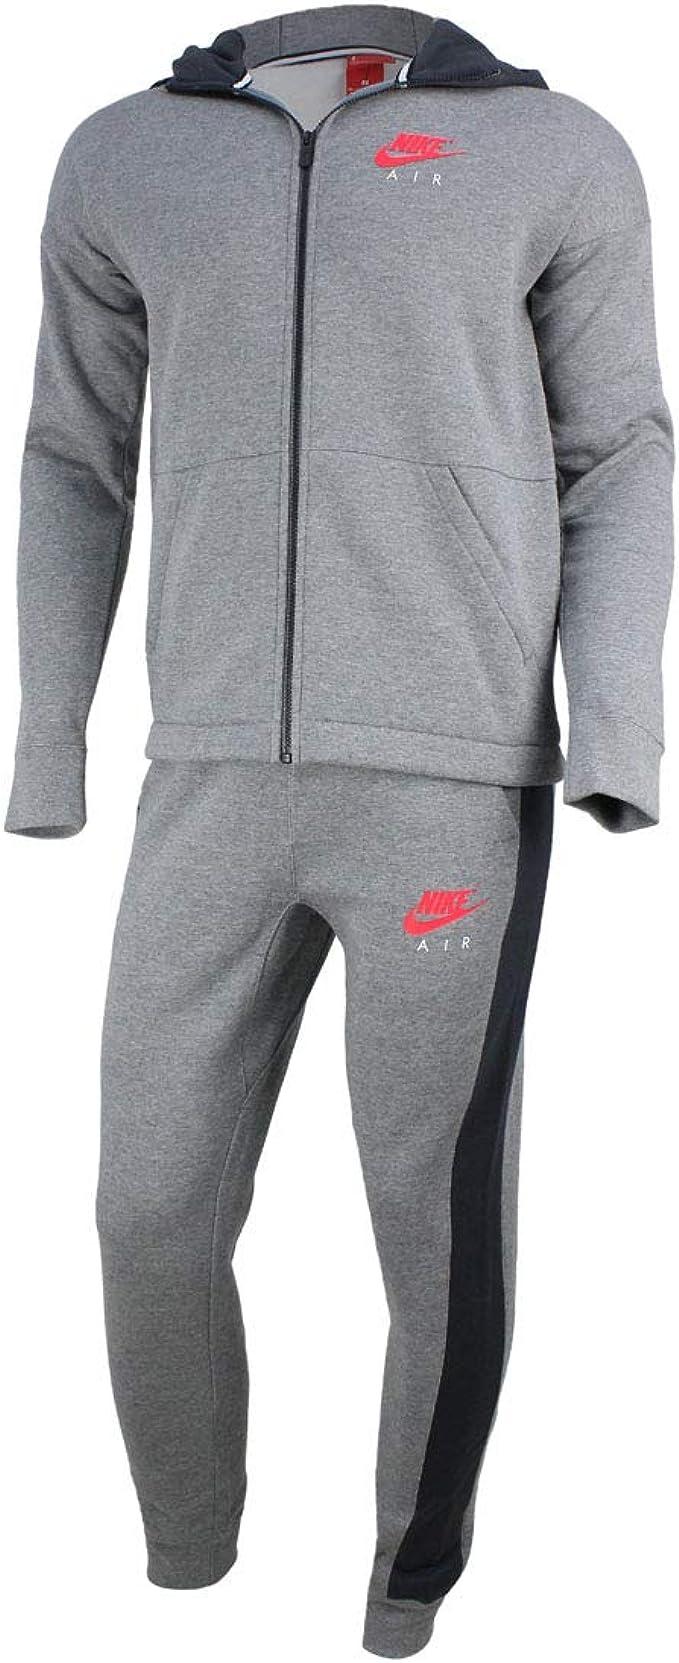 Nike Air NSW - Chándal Completo para Hombre Gris Gris L: Amazon.es ...